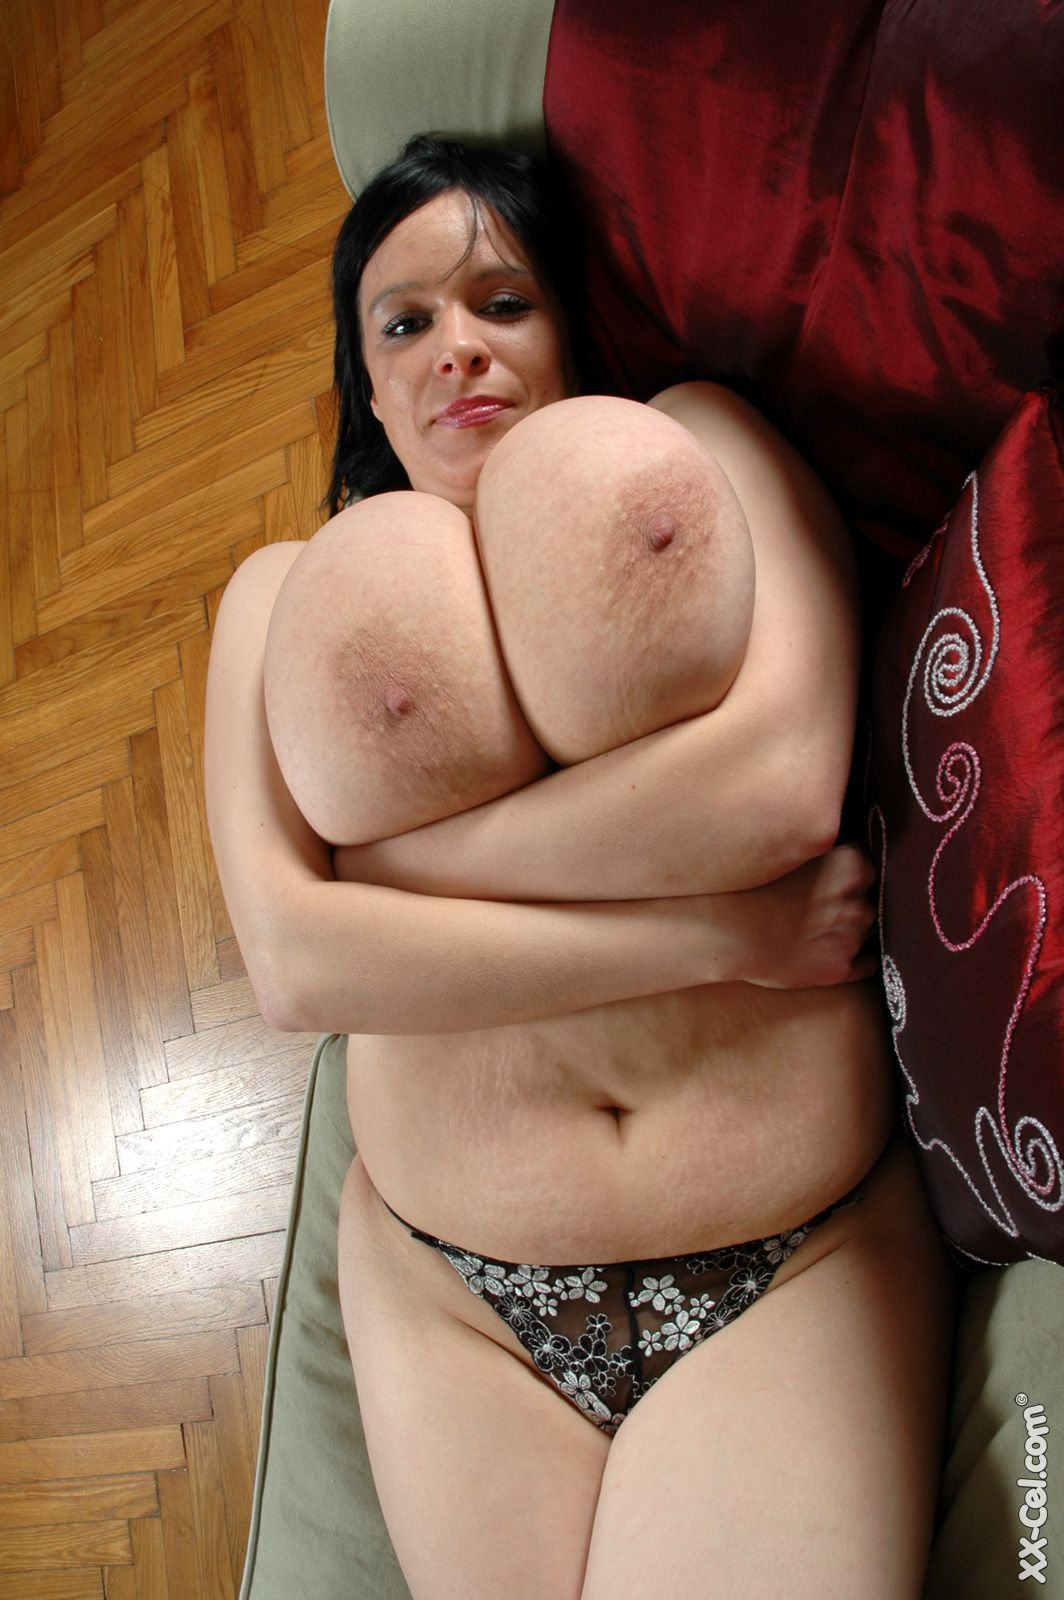 Enormous natural tits